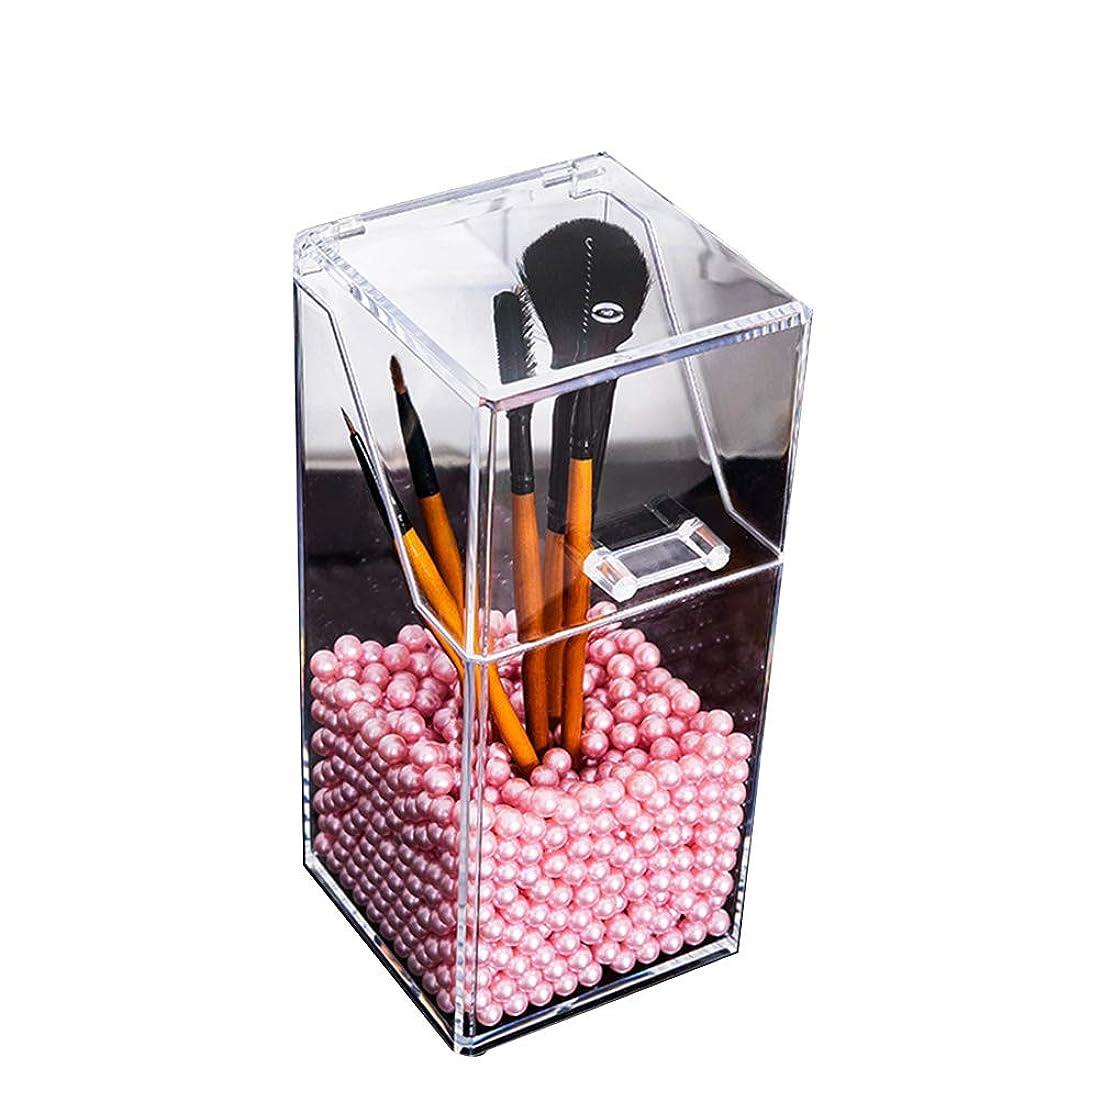 [YEMOCILE] メイクボックス レディース ふた付き メイクブラシ 化粧品入れ 収納 透明 引き出し小物 アクリル製 真珠 高品質 ピンク